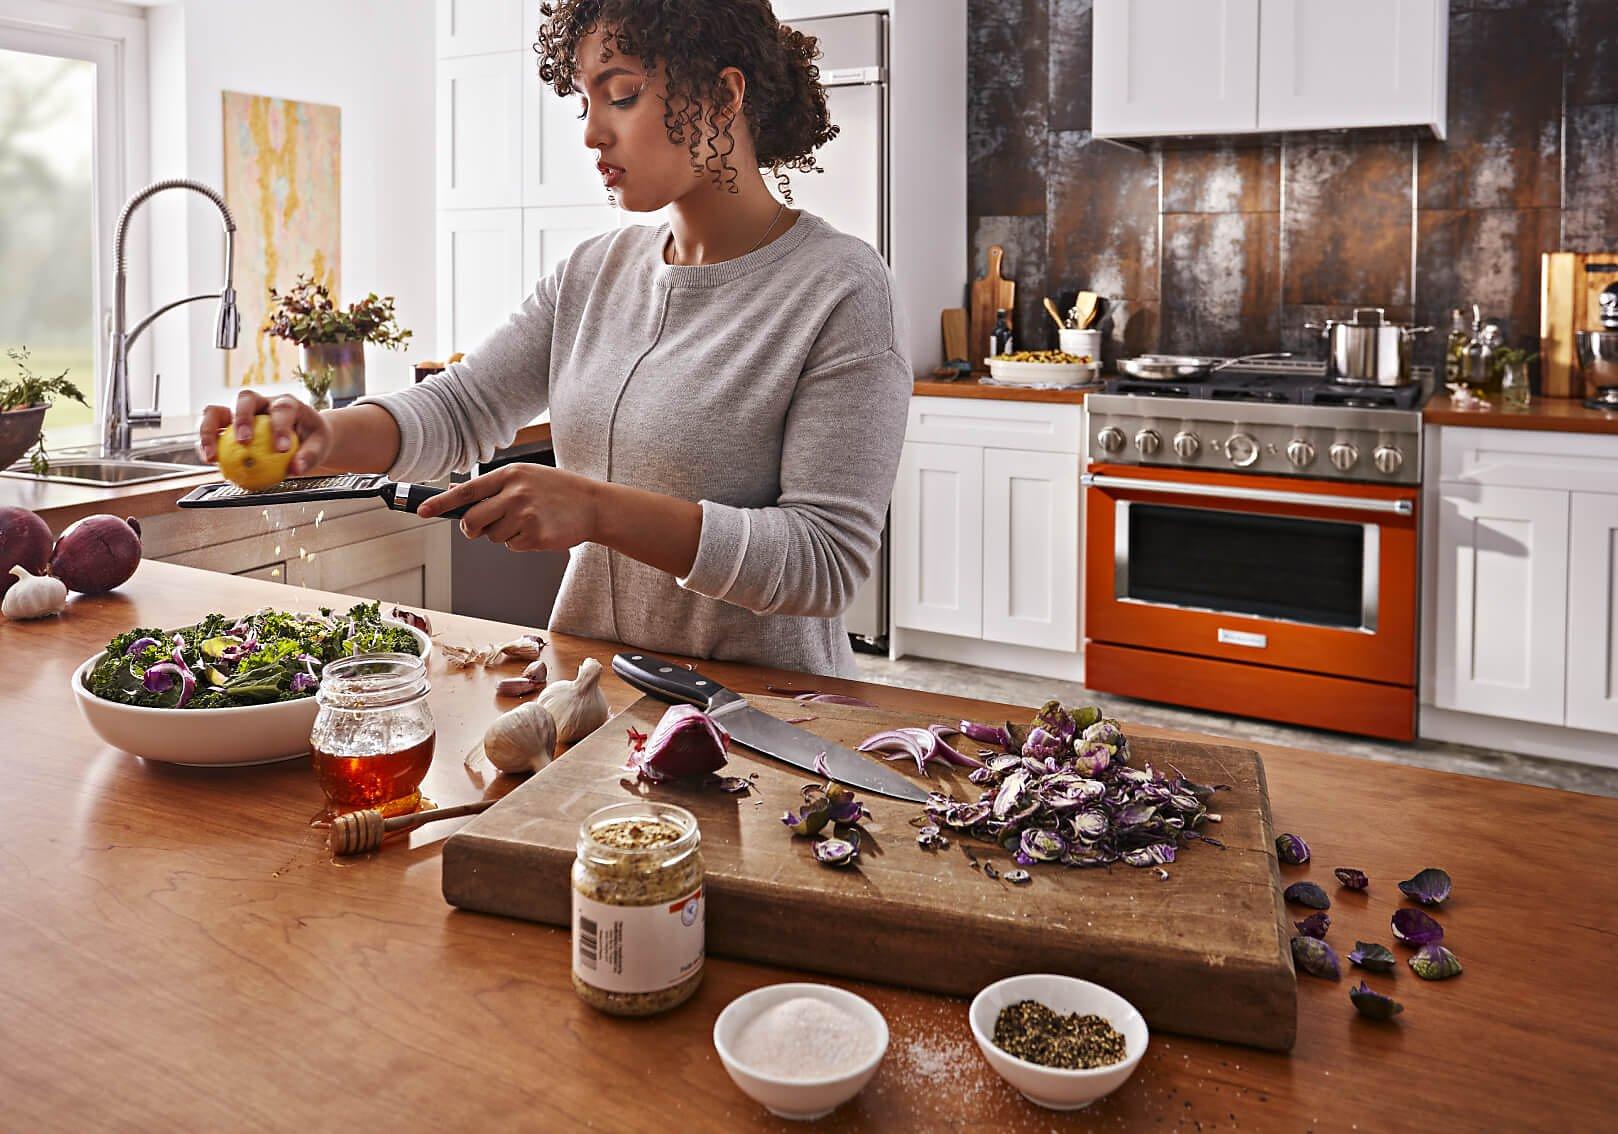 Woman in kitchen preparing a salad